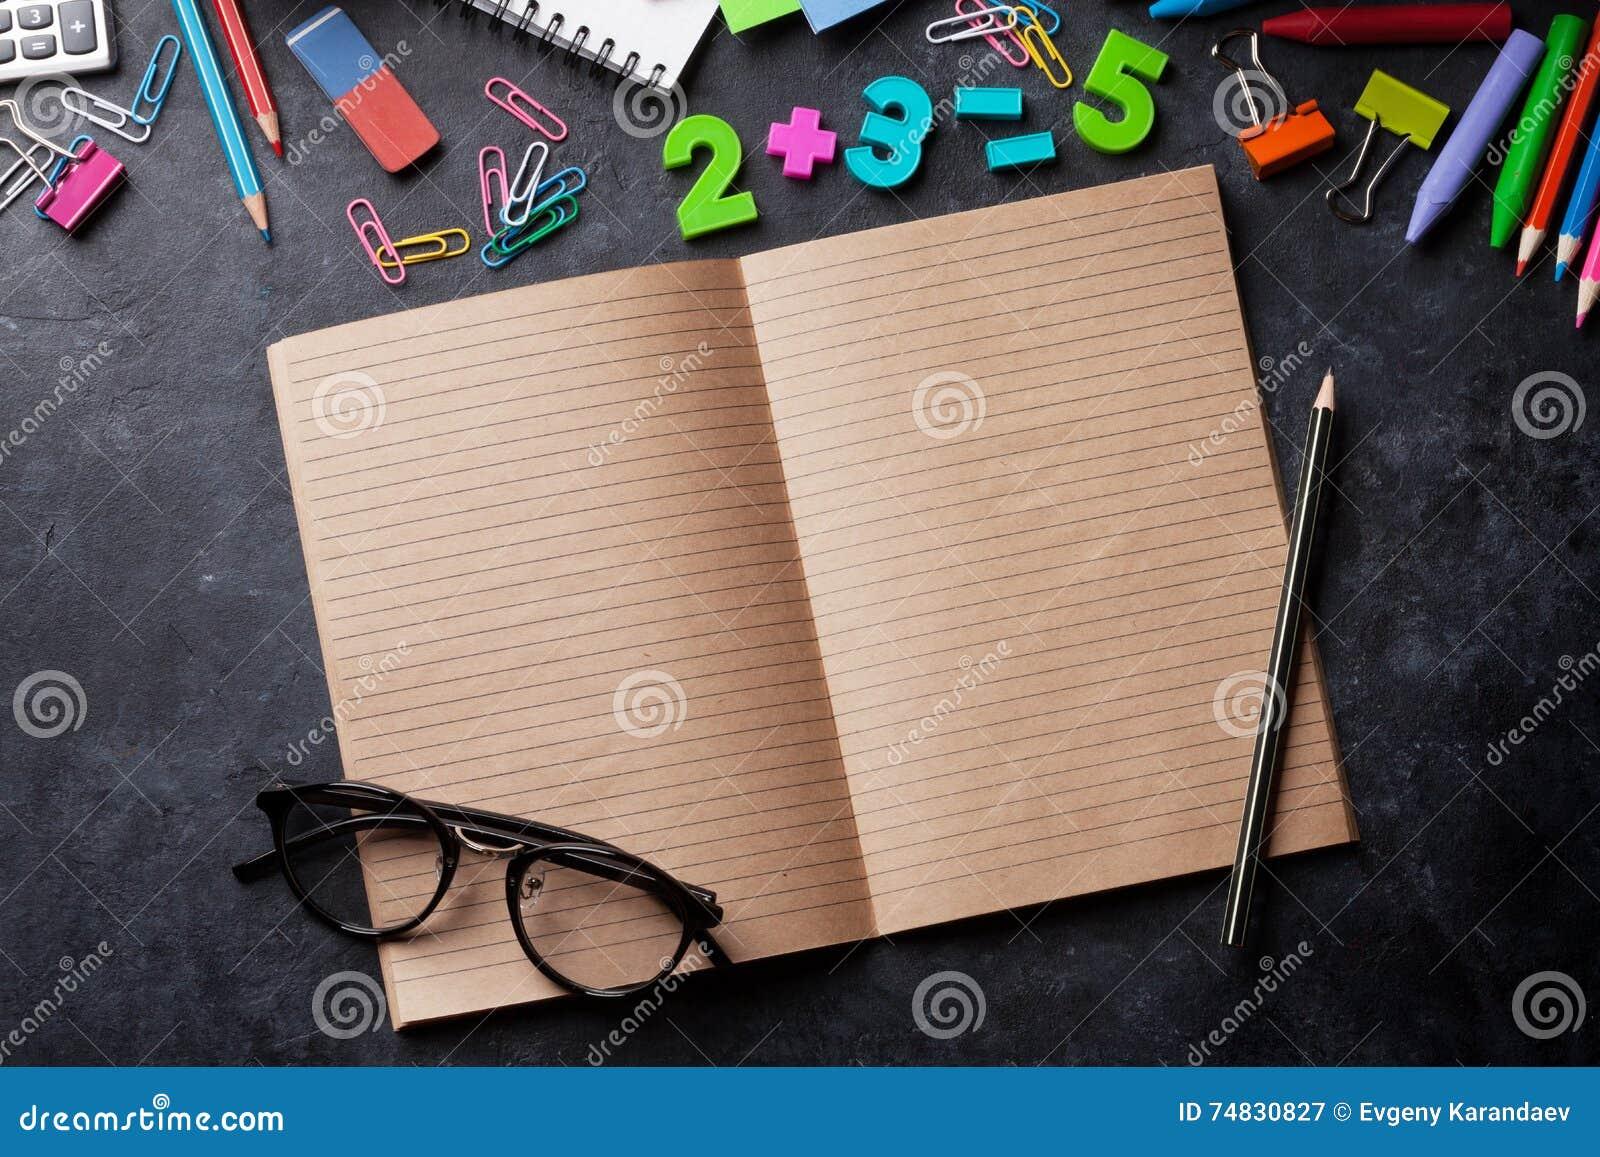 Spectacles: book of optics and school dress essay